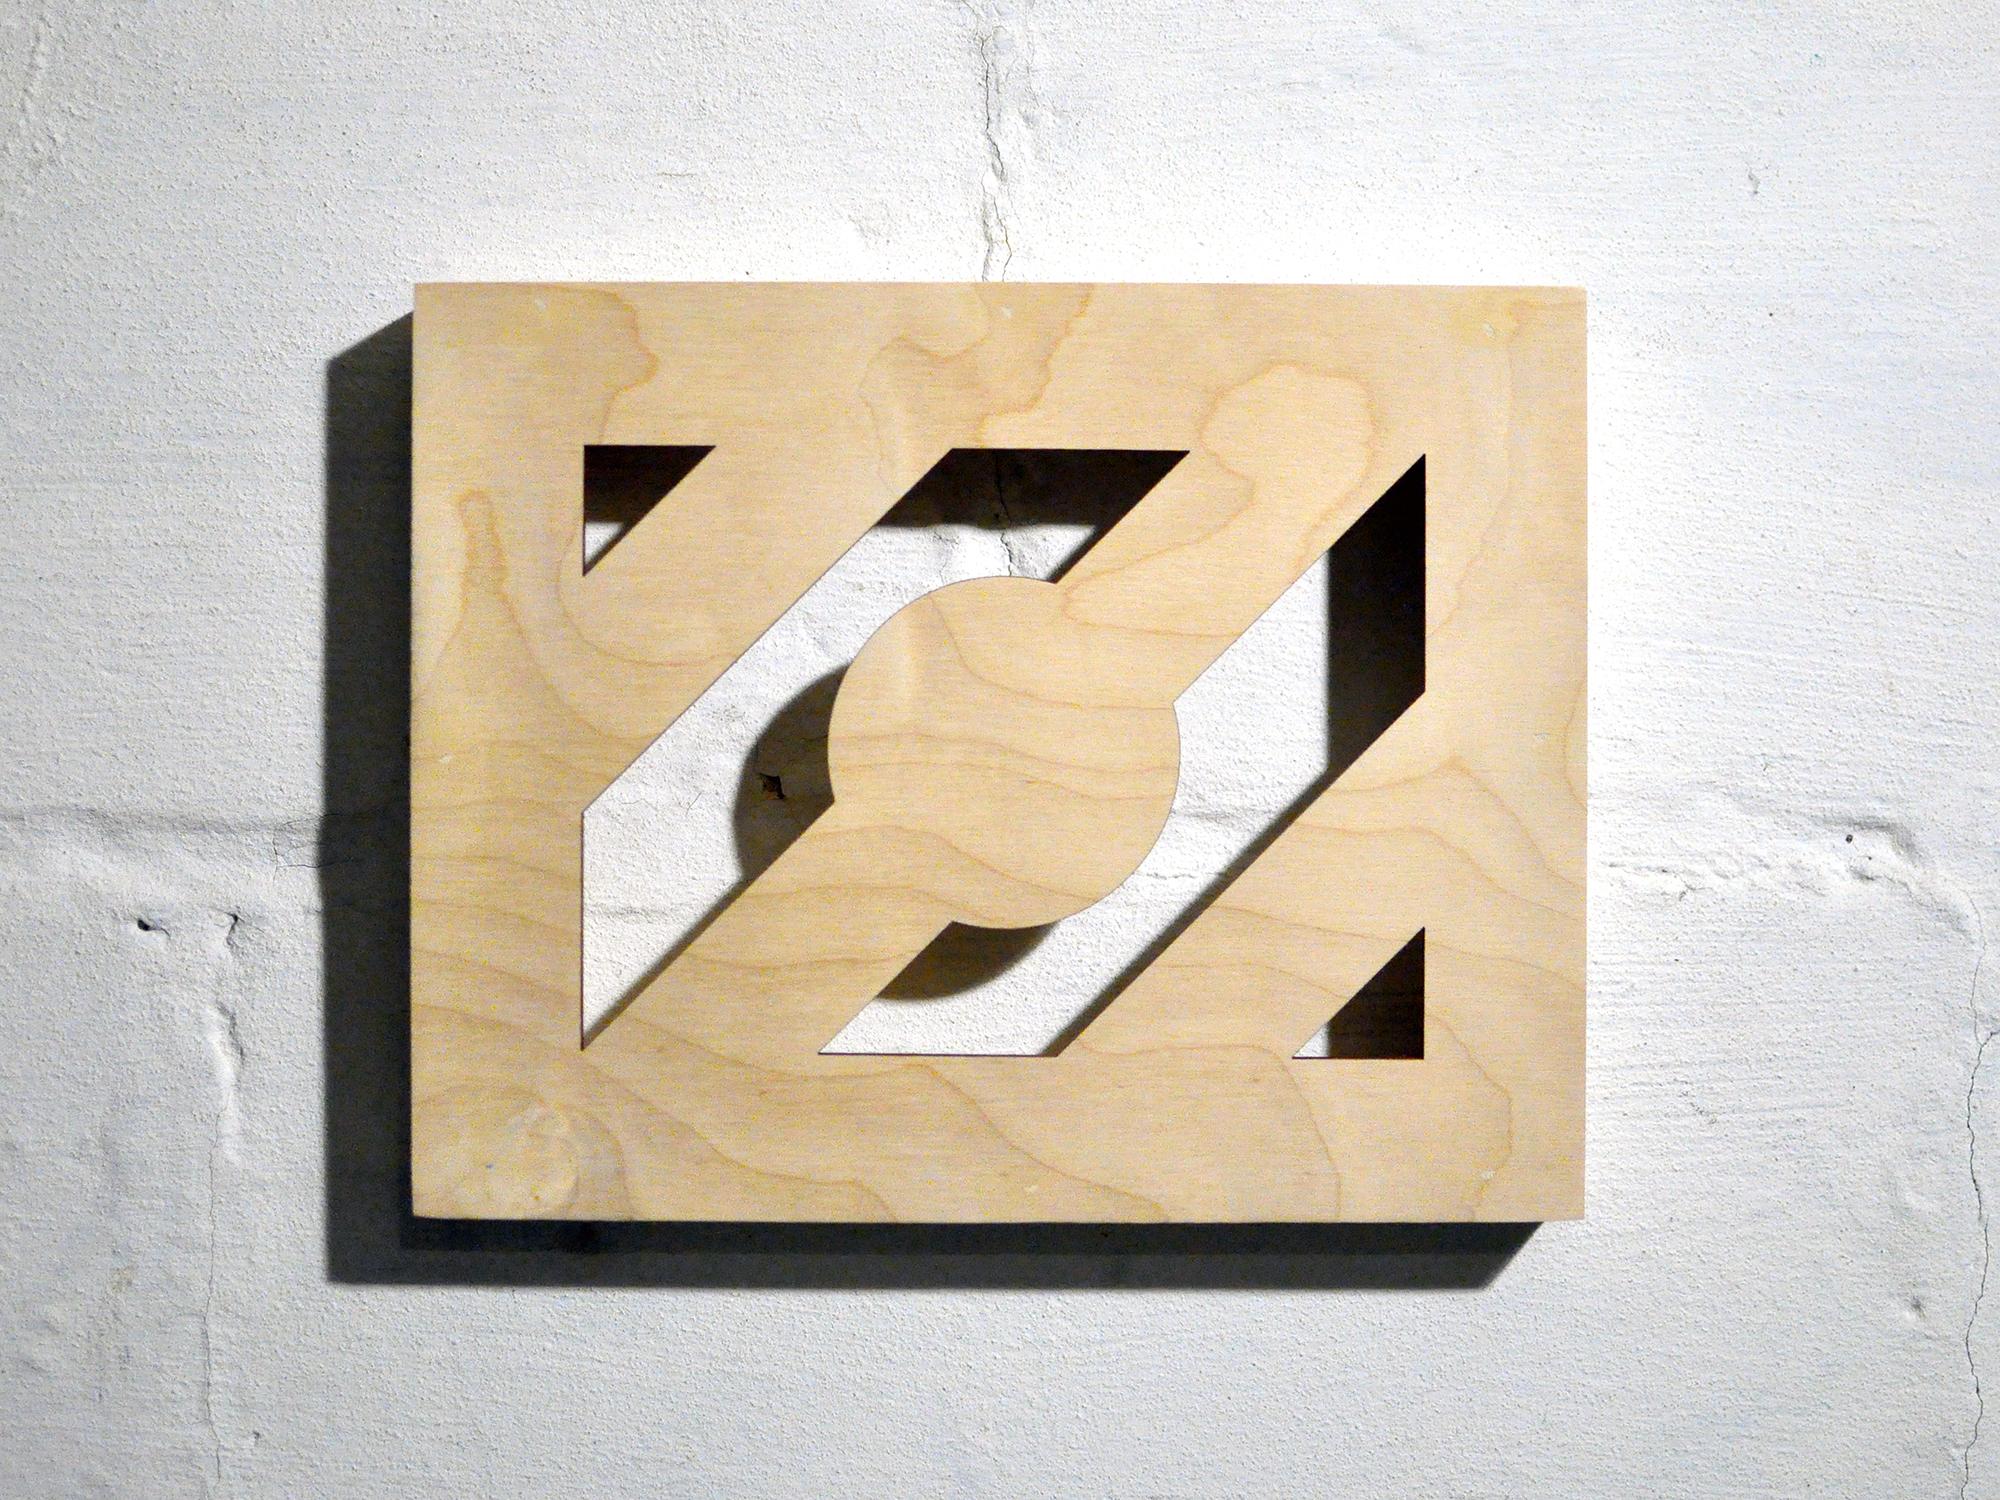 Acd Stencil Andrew Cloutier Design